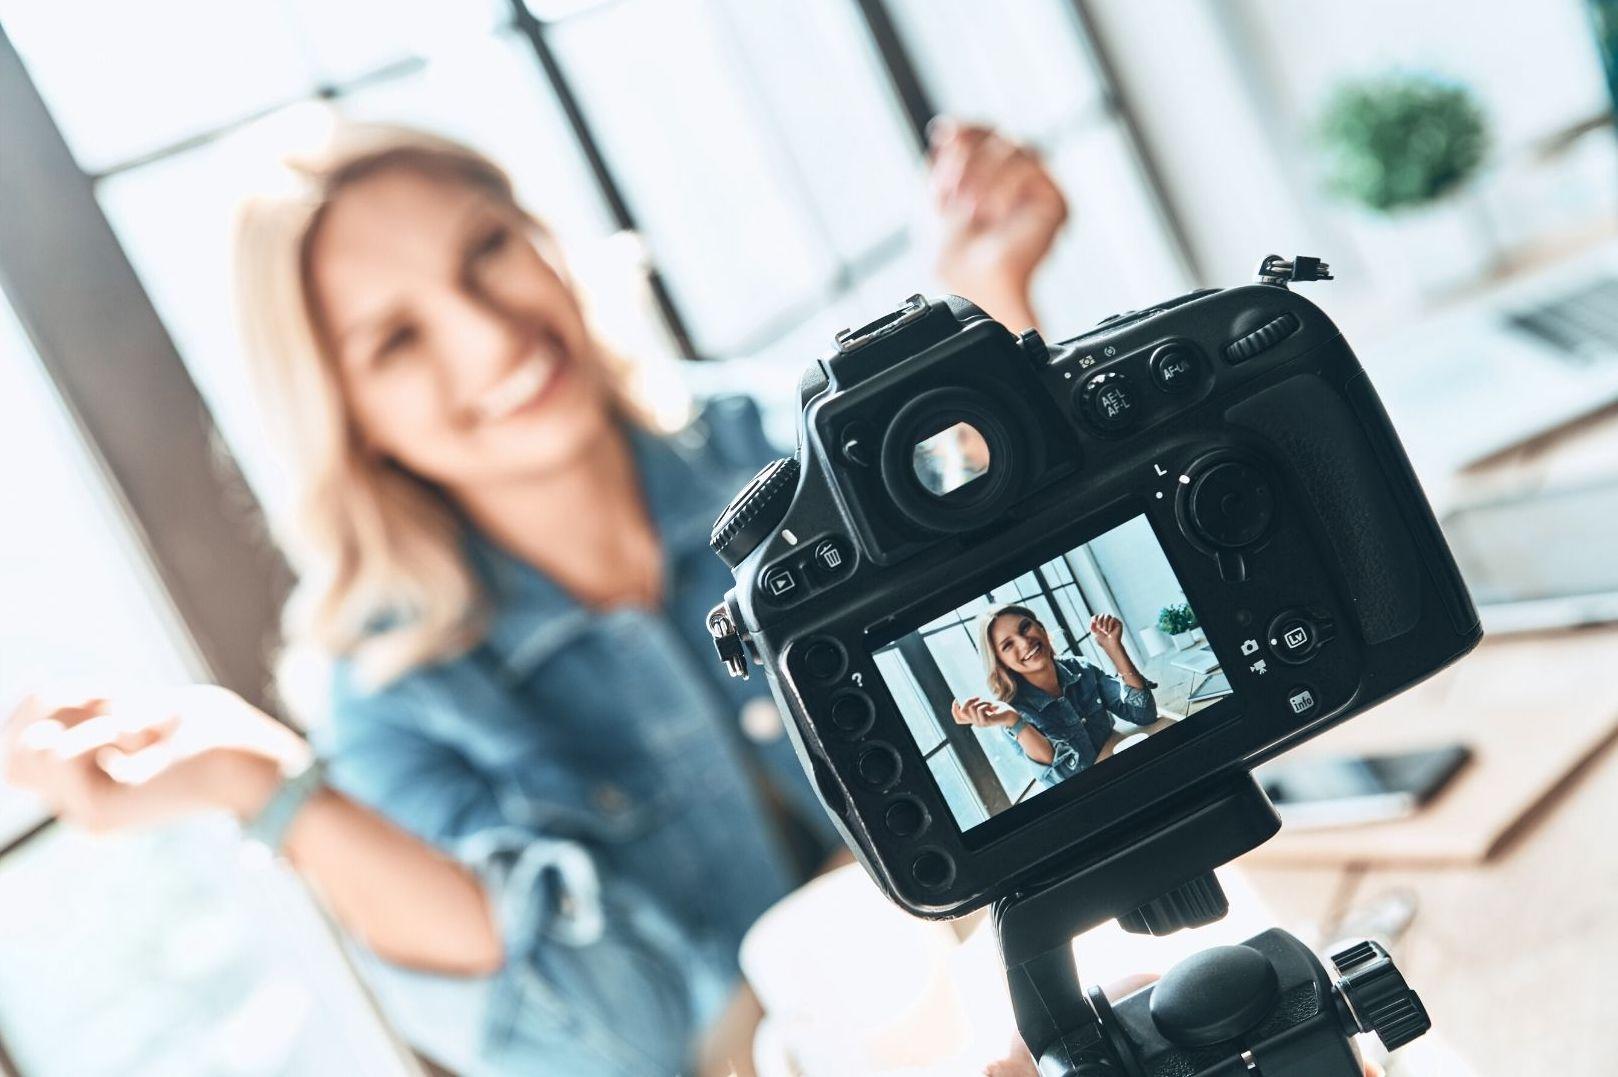 Sveriges största influencers Instagram